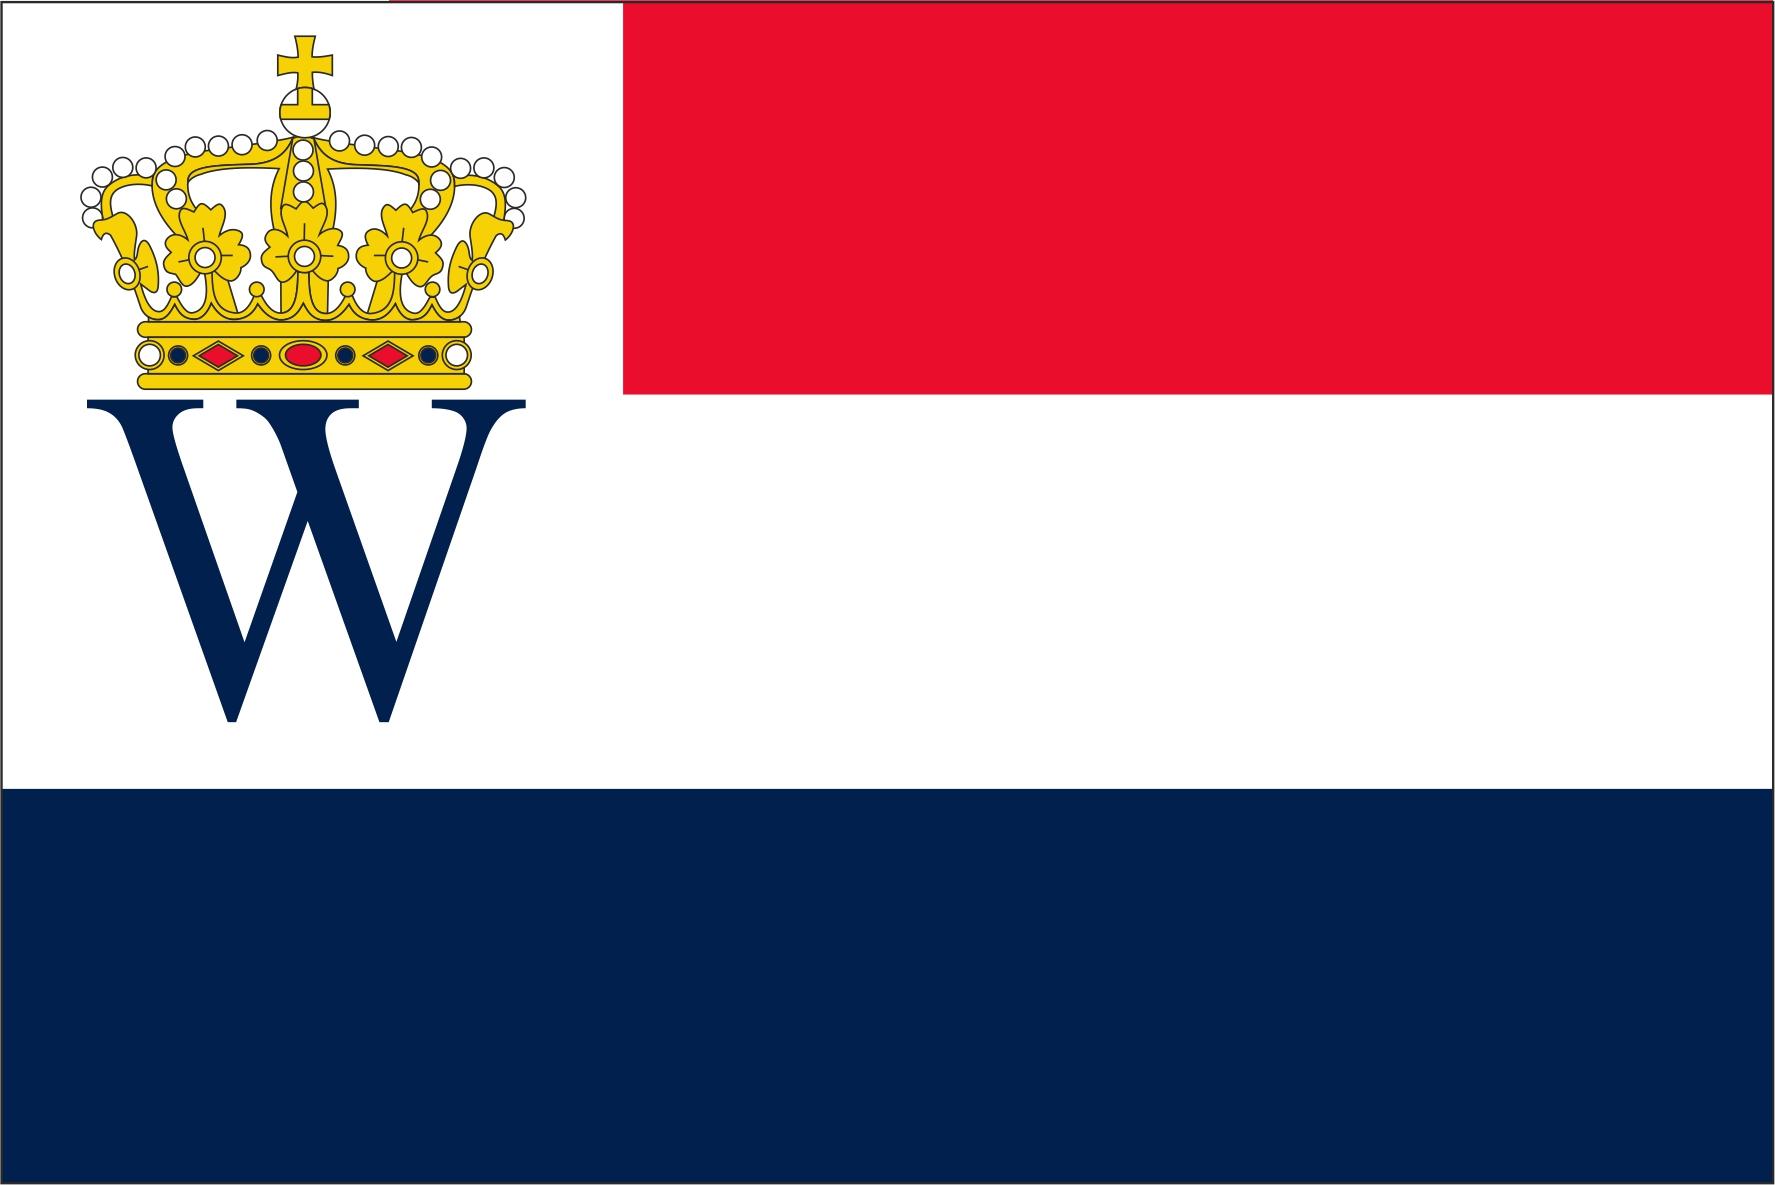 Koninklijke Watersportvlag 70x100cm